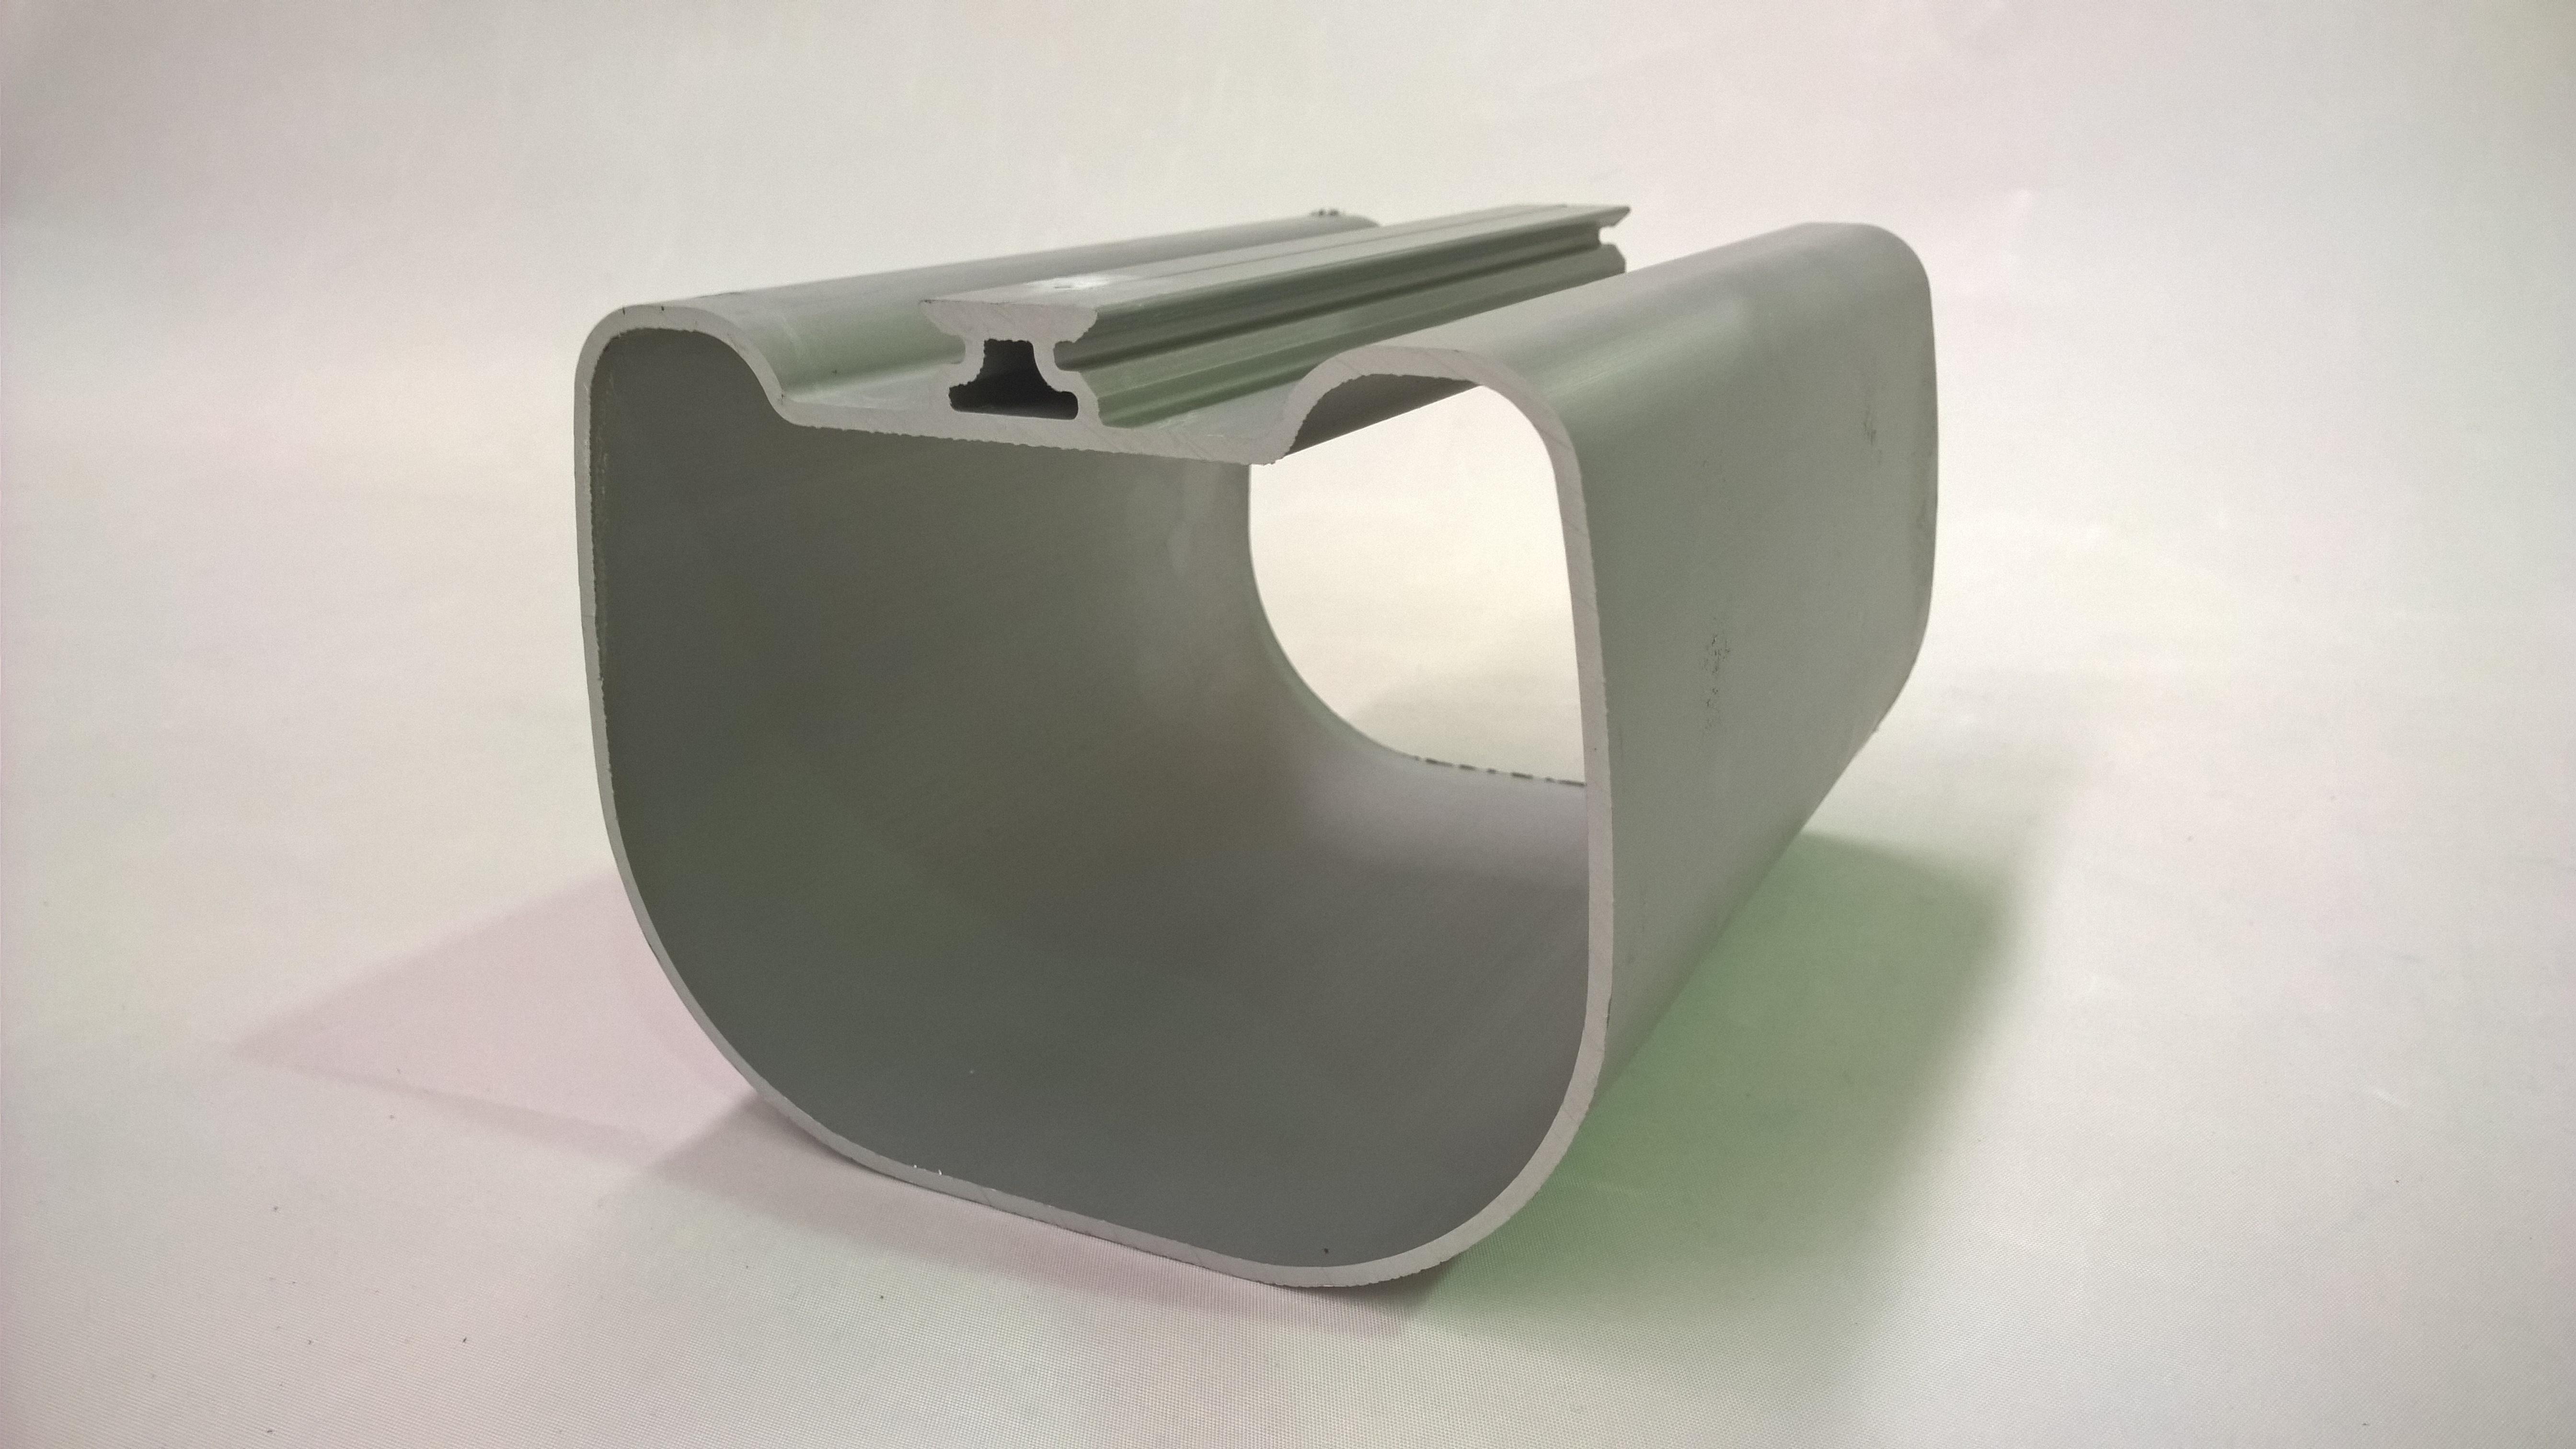 One Design Center - Goodall C2 Akterbalkrör utan beslag f174d57c86c3e